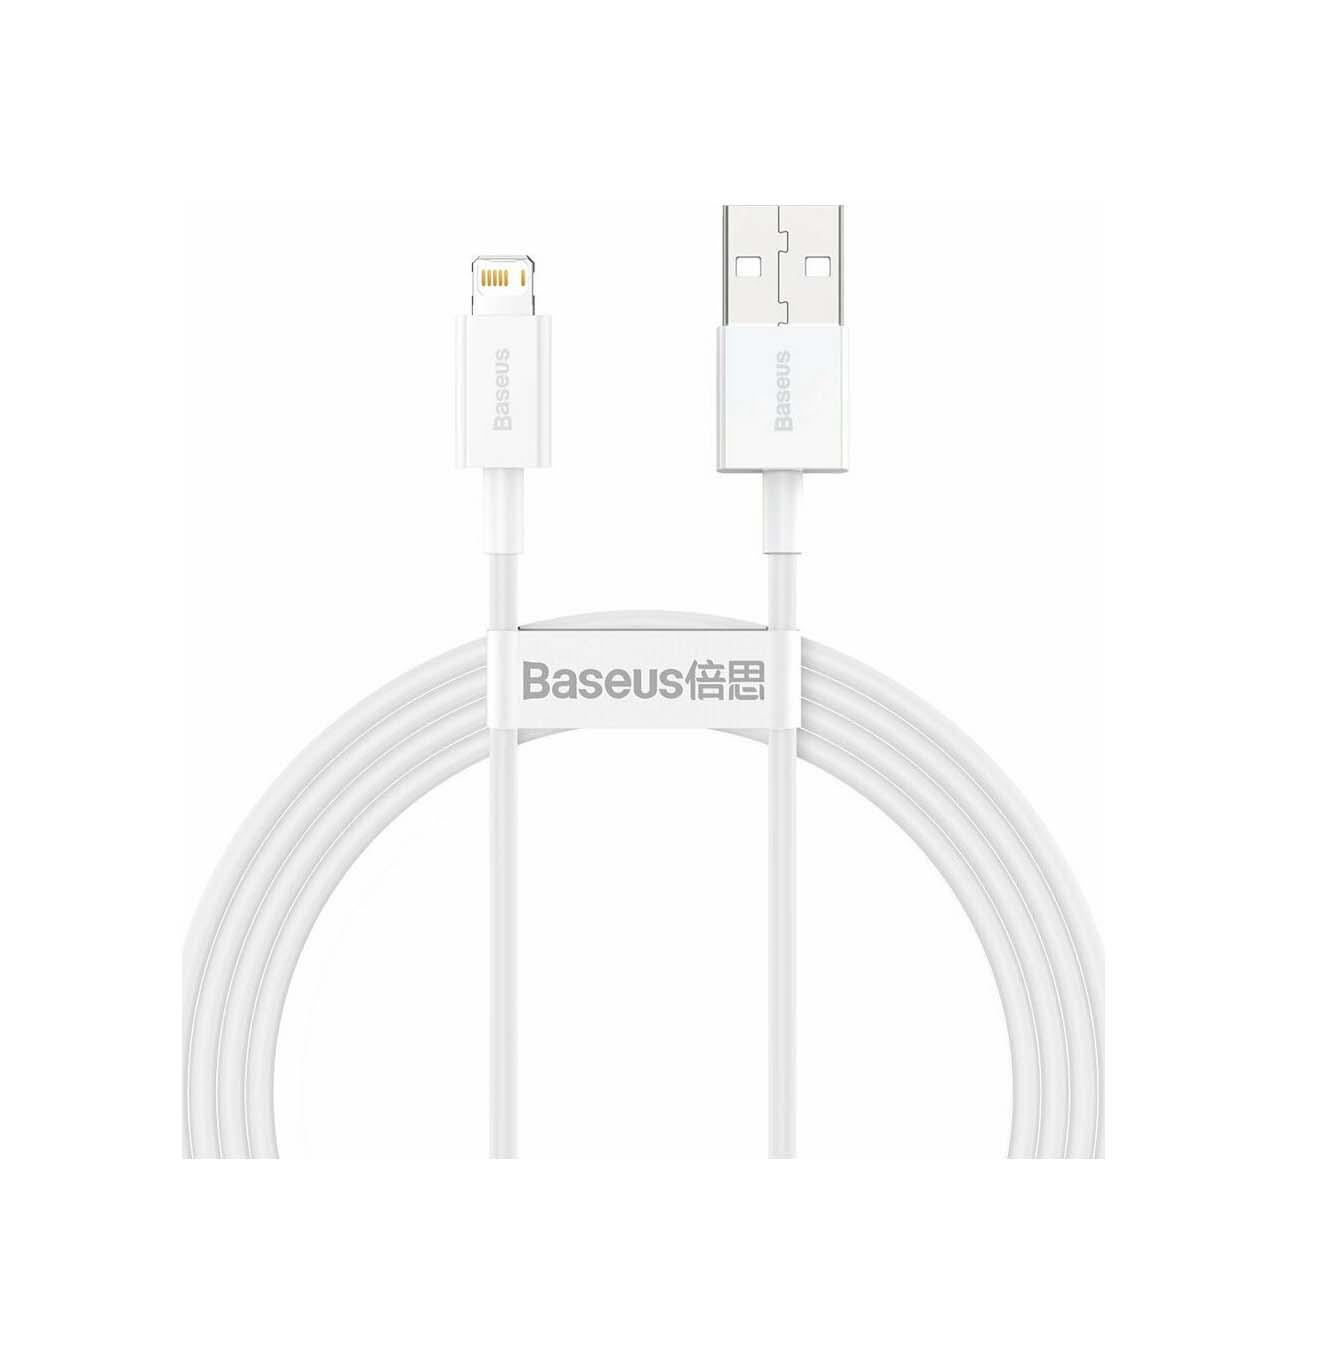 Baseus USB Cable - Superior Series CALYS-B02 USB Lightning 1.5M 2.4A Quick Charging White